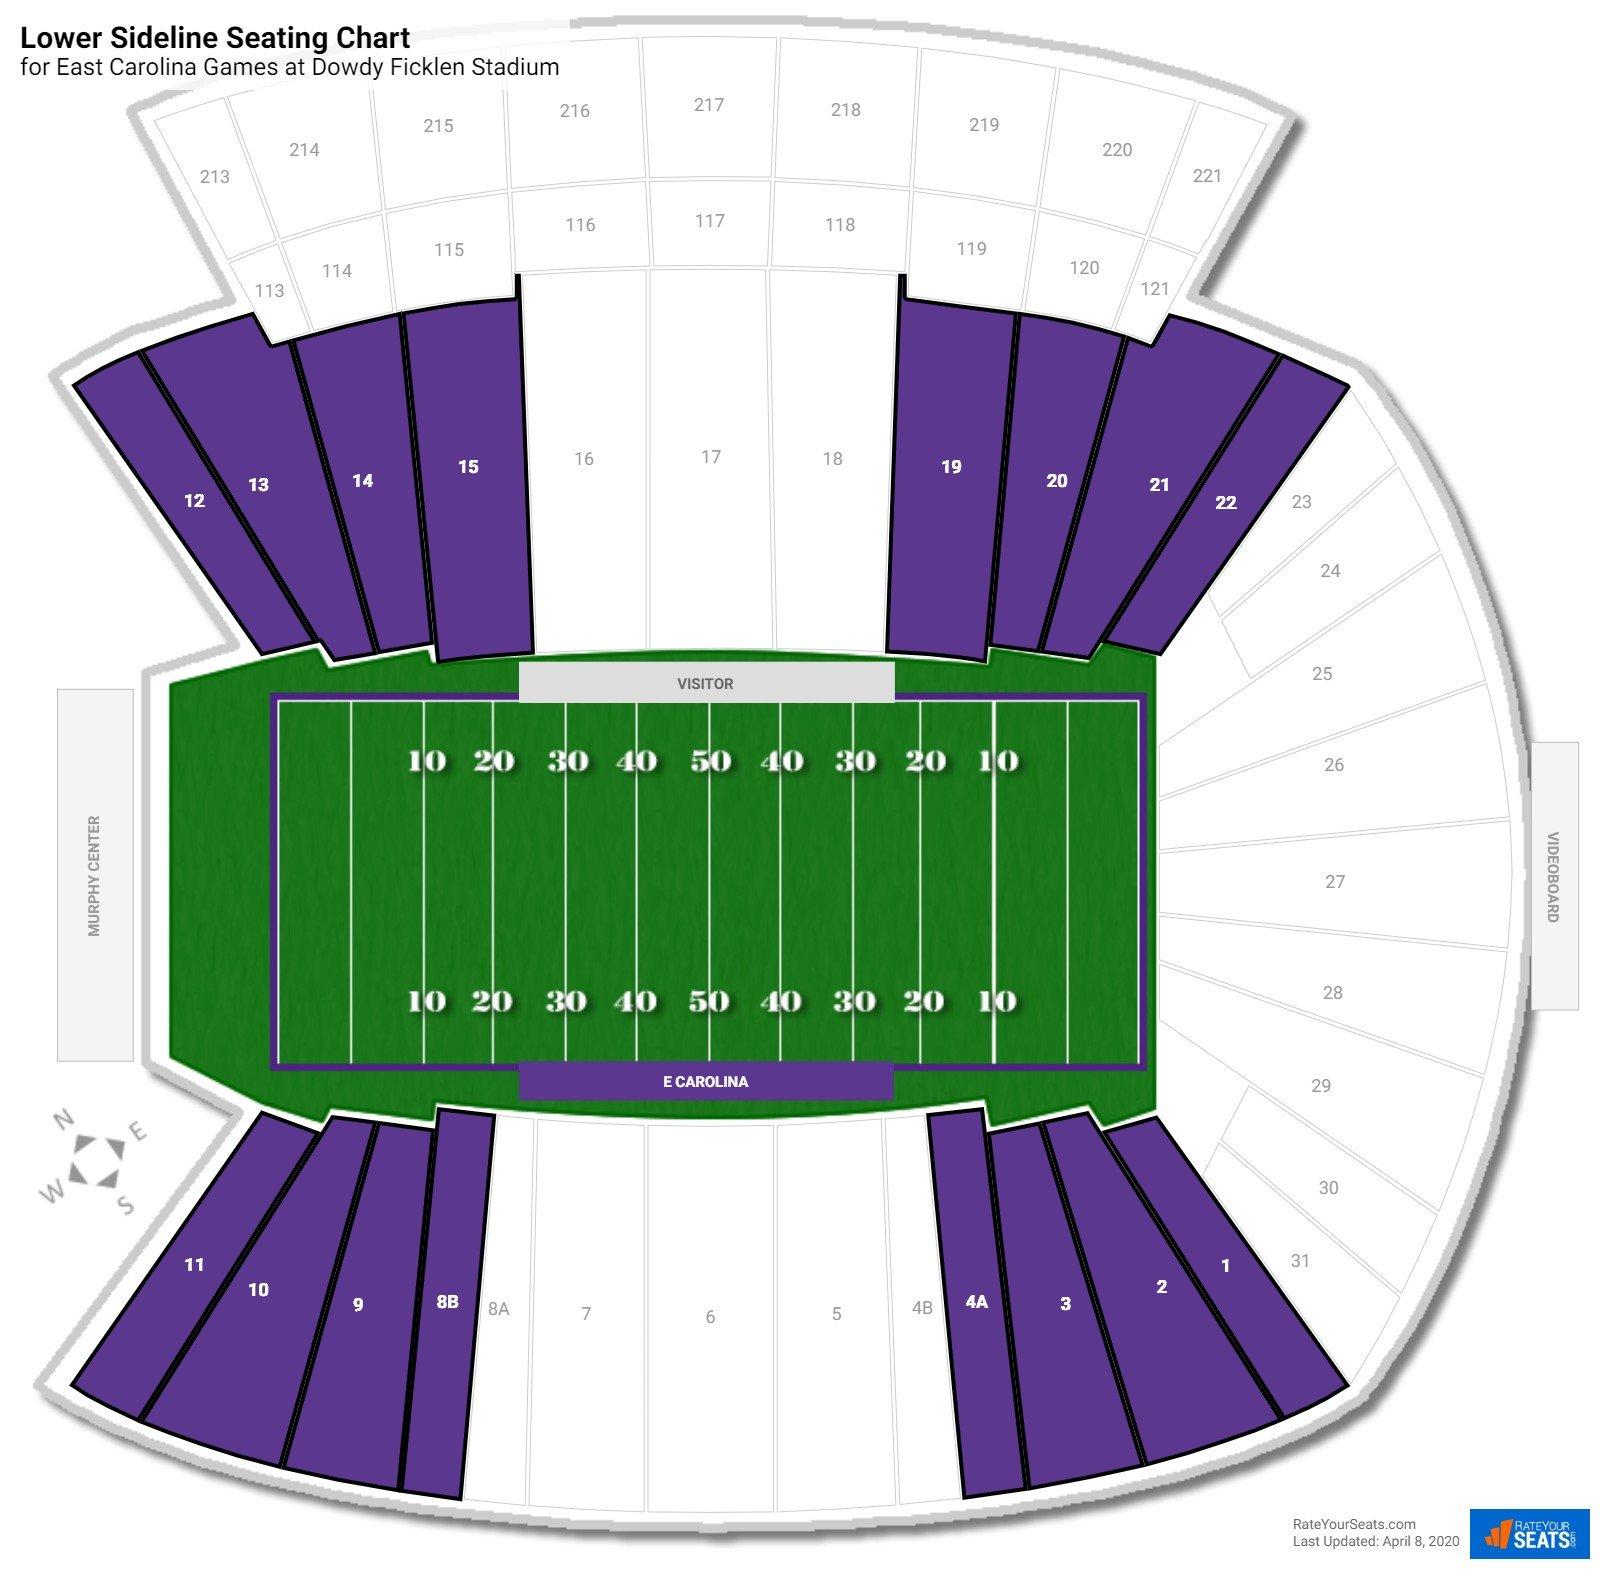 Dowdy Ficklen Stadium (East Carolina) Seating Guide